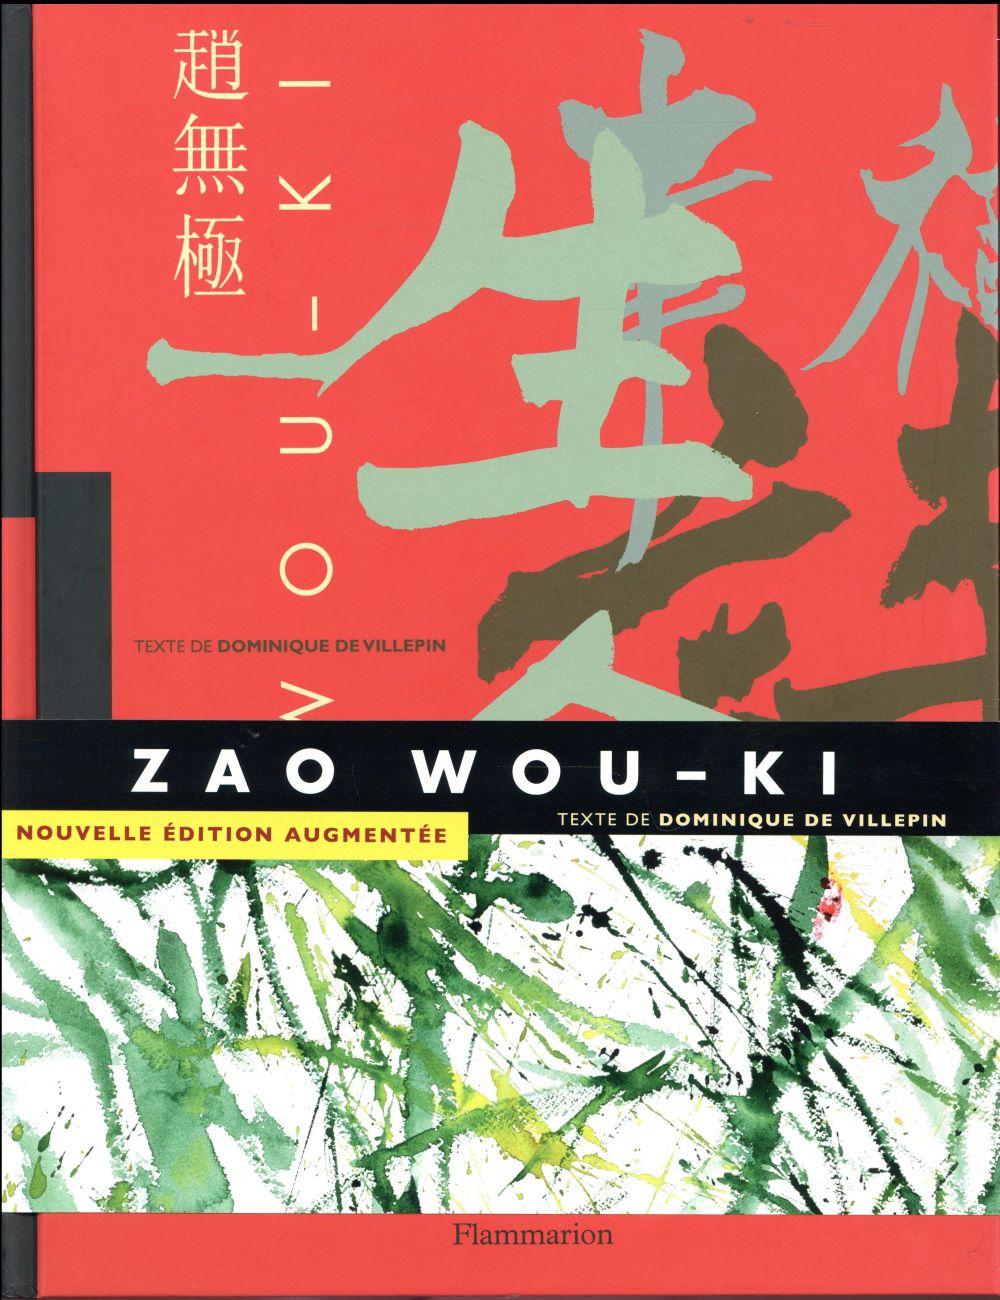 ZAO WOU-KI (NOUVELLE EDITION AUGMENTEE)